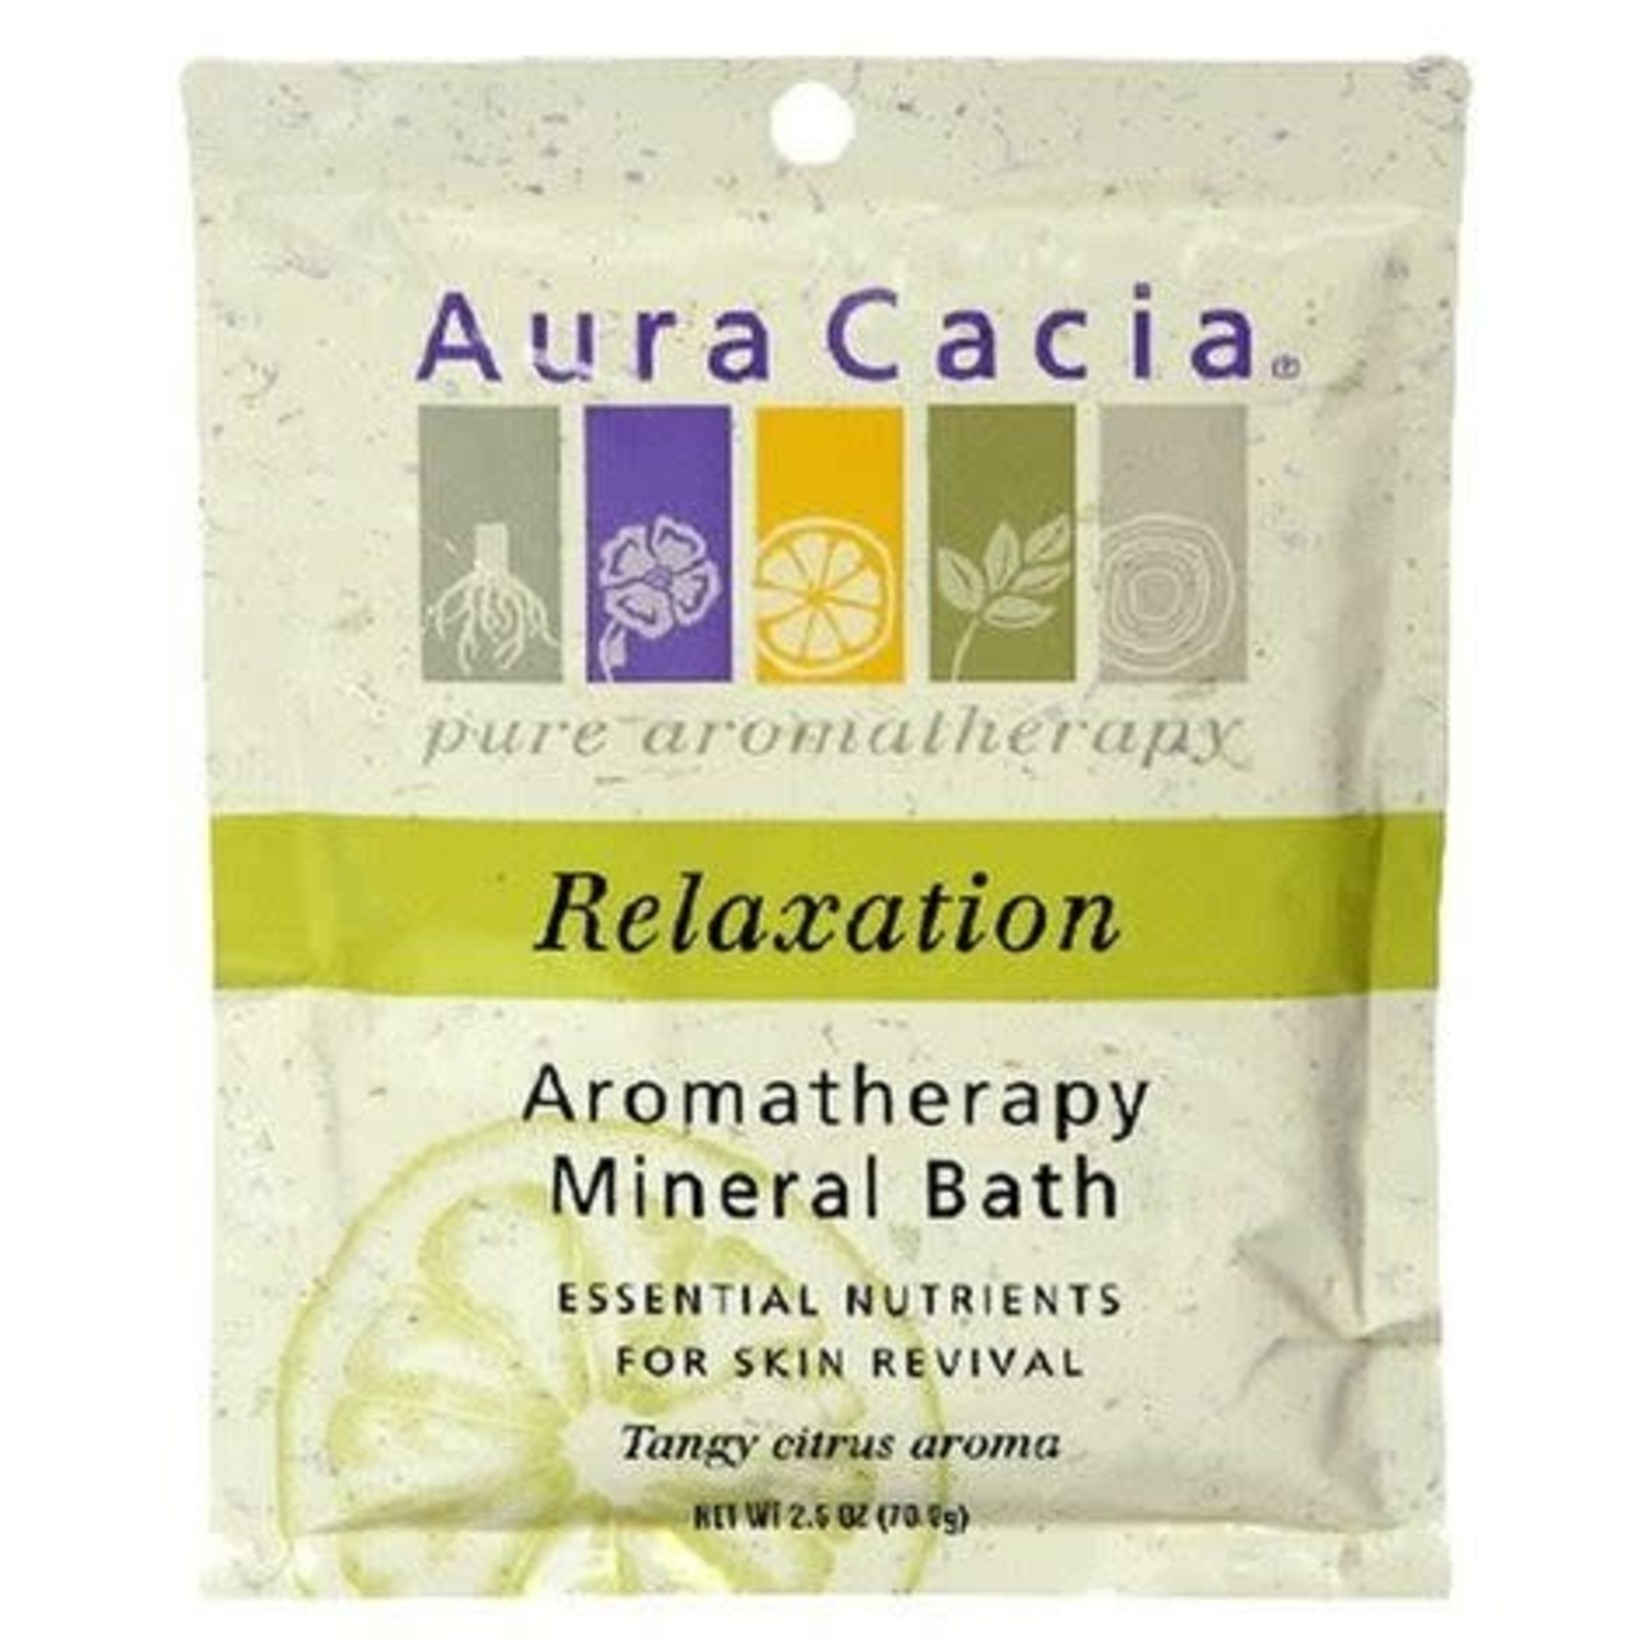 Aura Cacia Aura Cacia Tangy Citrus Relaxation Mineral Bath